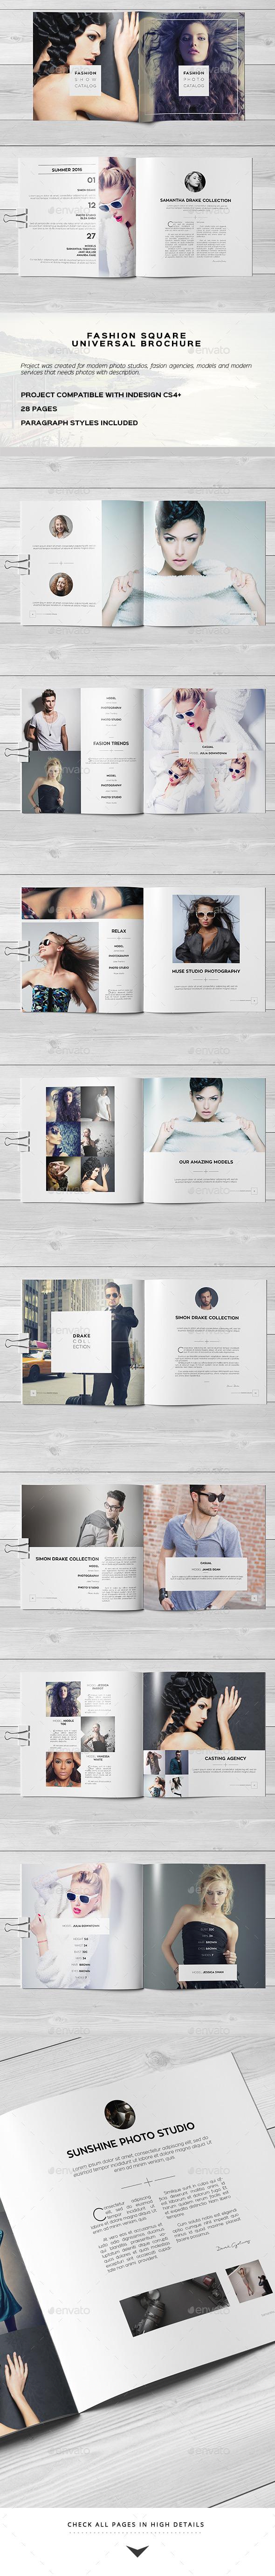 Fashion Square Universal Brochure / Catalog - Catalogs Brochures